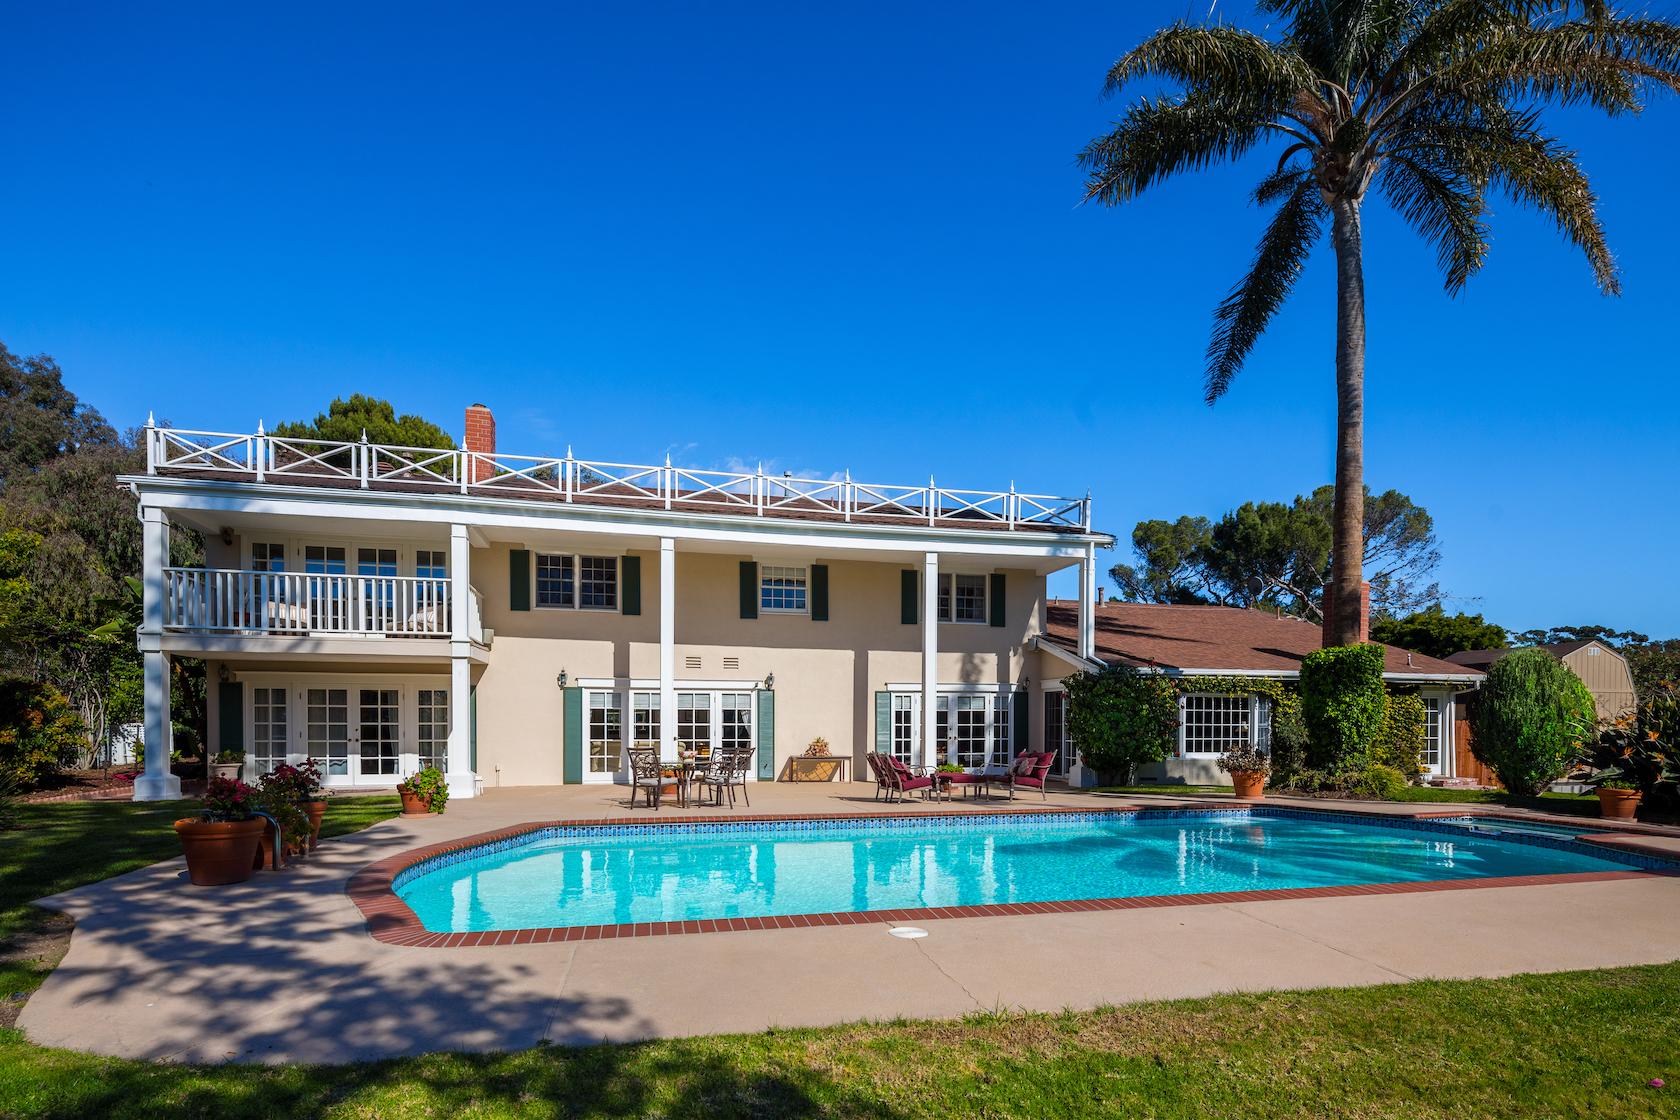 034 6509 Wandermere Road Malibu For Sale Lease The Malibu Life Team Luxury Real Estate.jpg